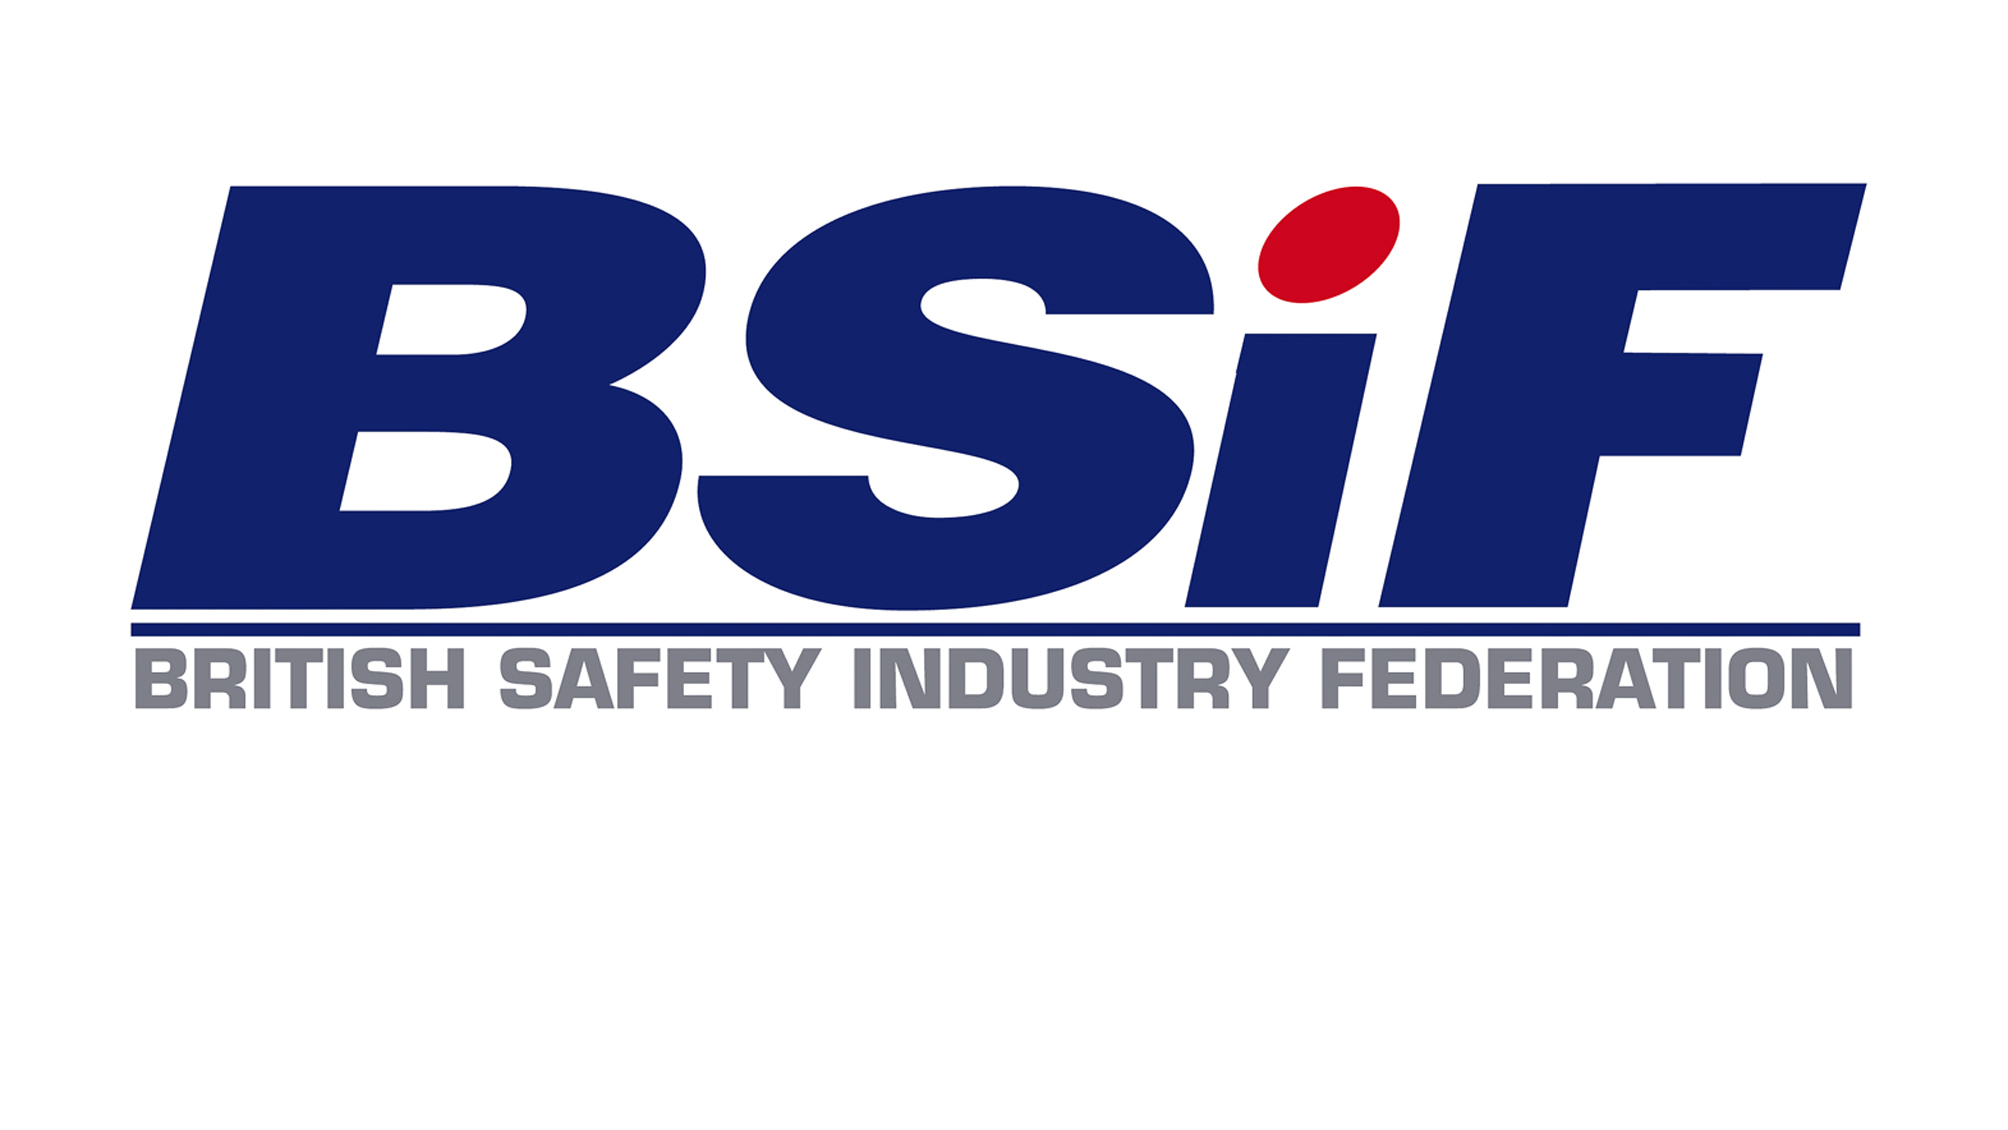 BSIF-logo.jpg